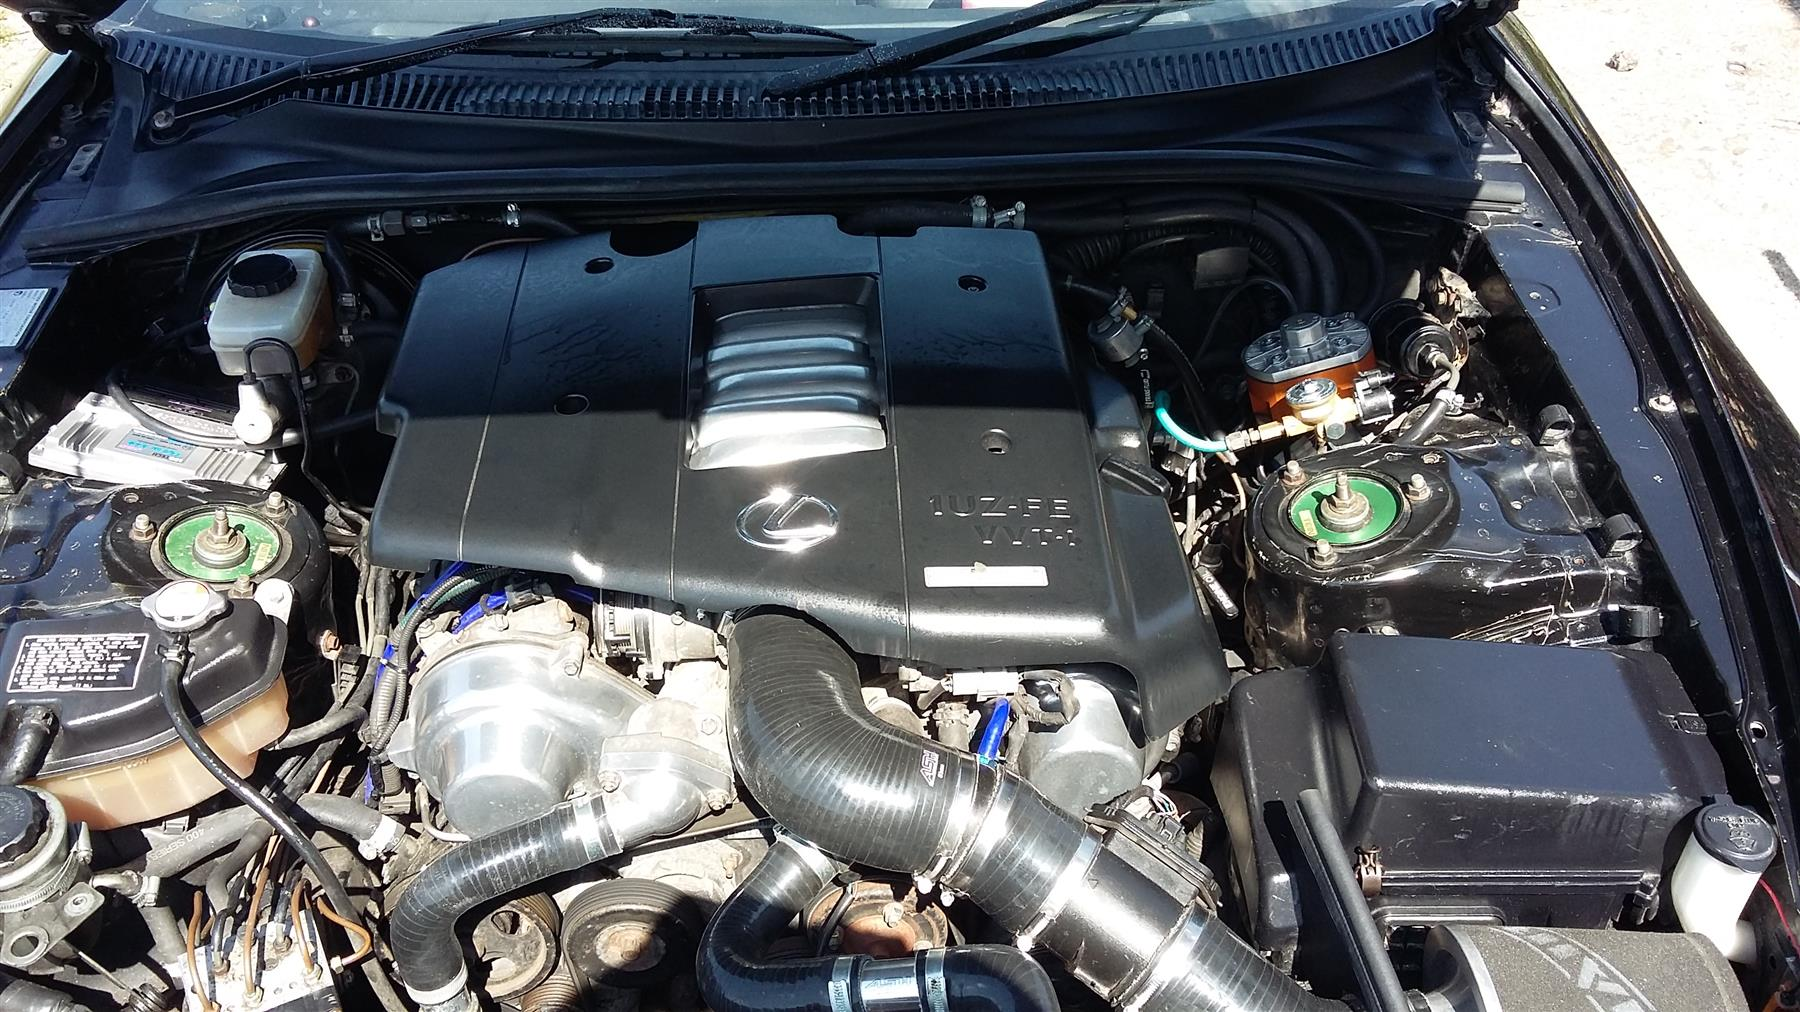 For Sale: 1994 Supra with a 1UZ – Engine Swap Depot